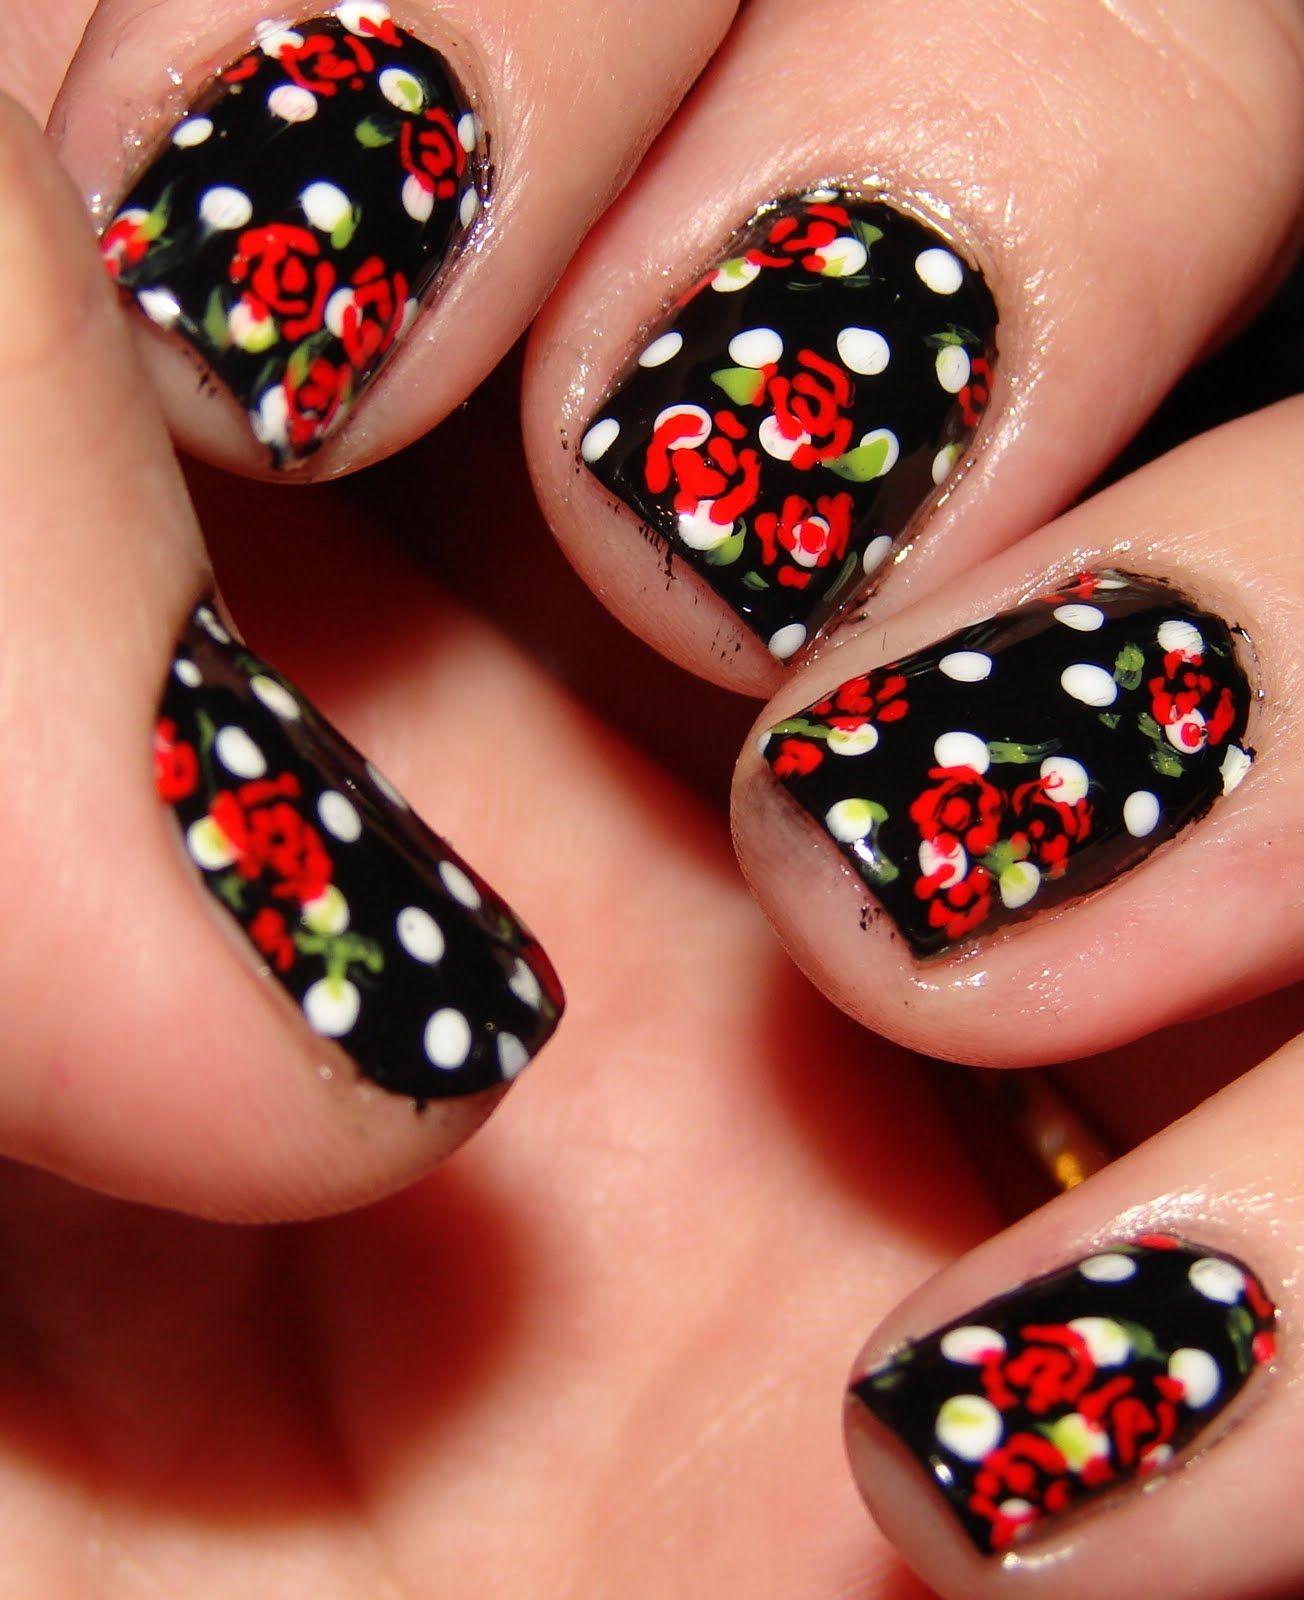 Kawaii nail art whatus black white and red all over pretty